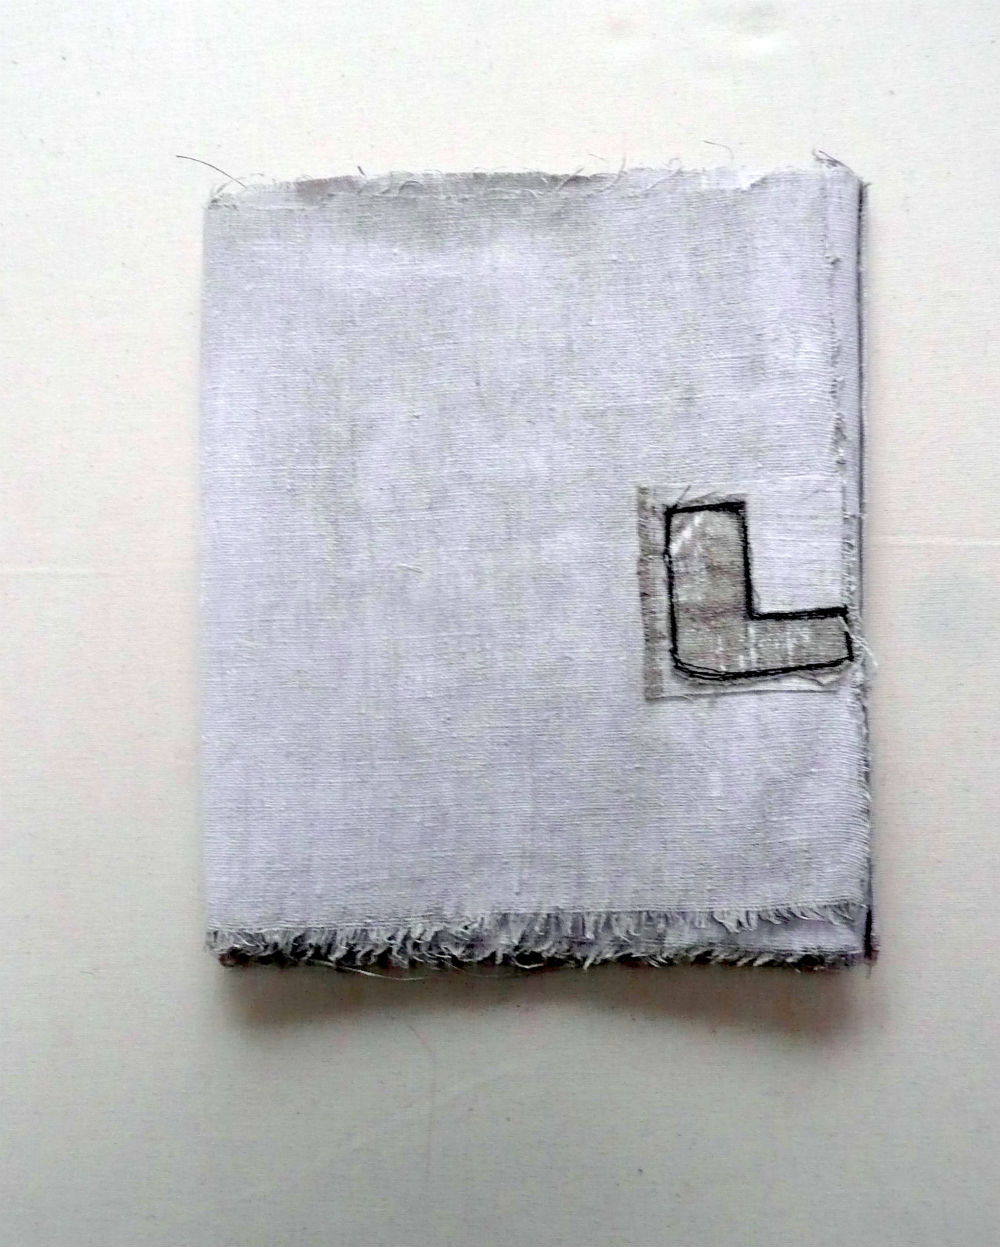 Boekje - uitklapbaar - dicht 22 - 26 cm. uitgeklapt 1.73 cm.